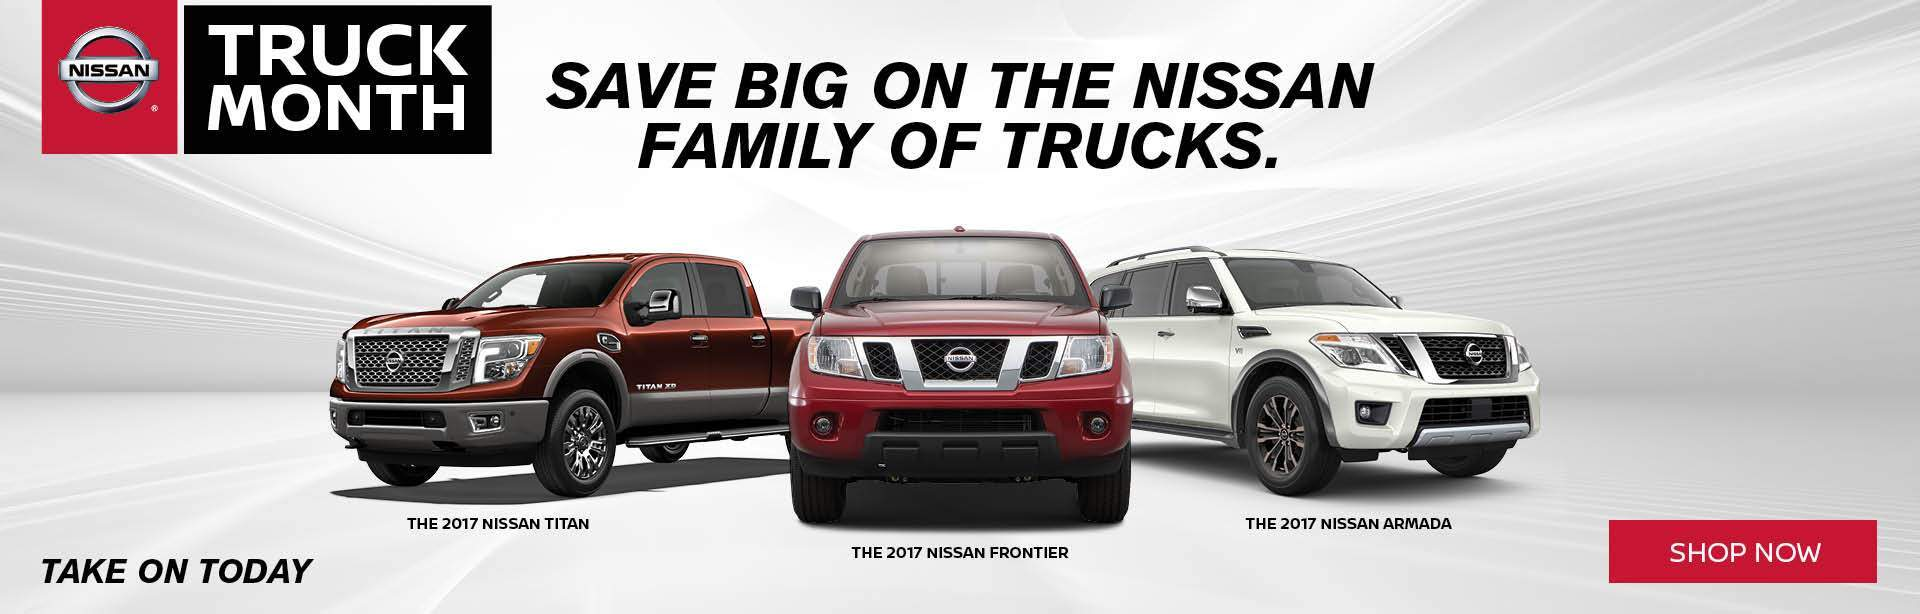 Truck month 2017 nissan sentra